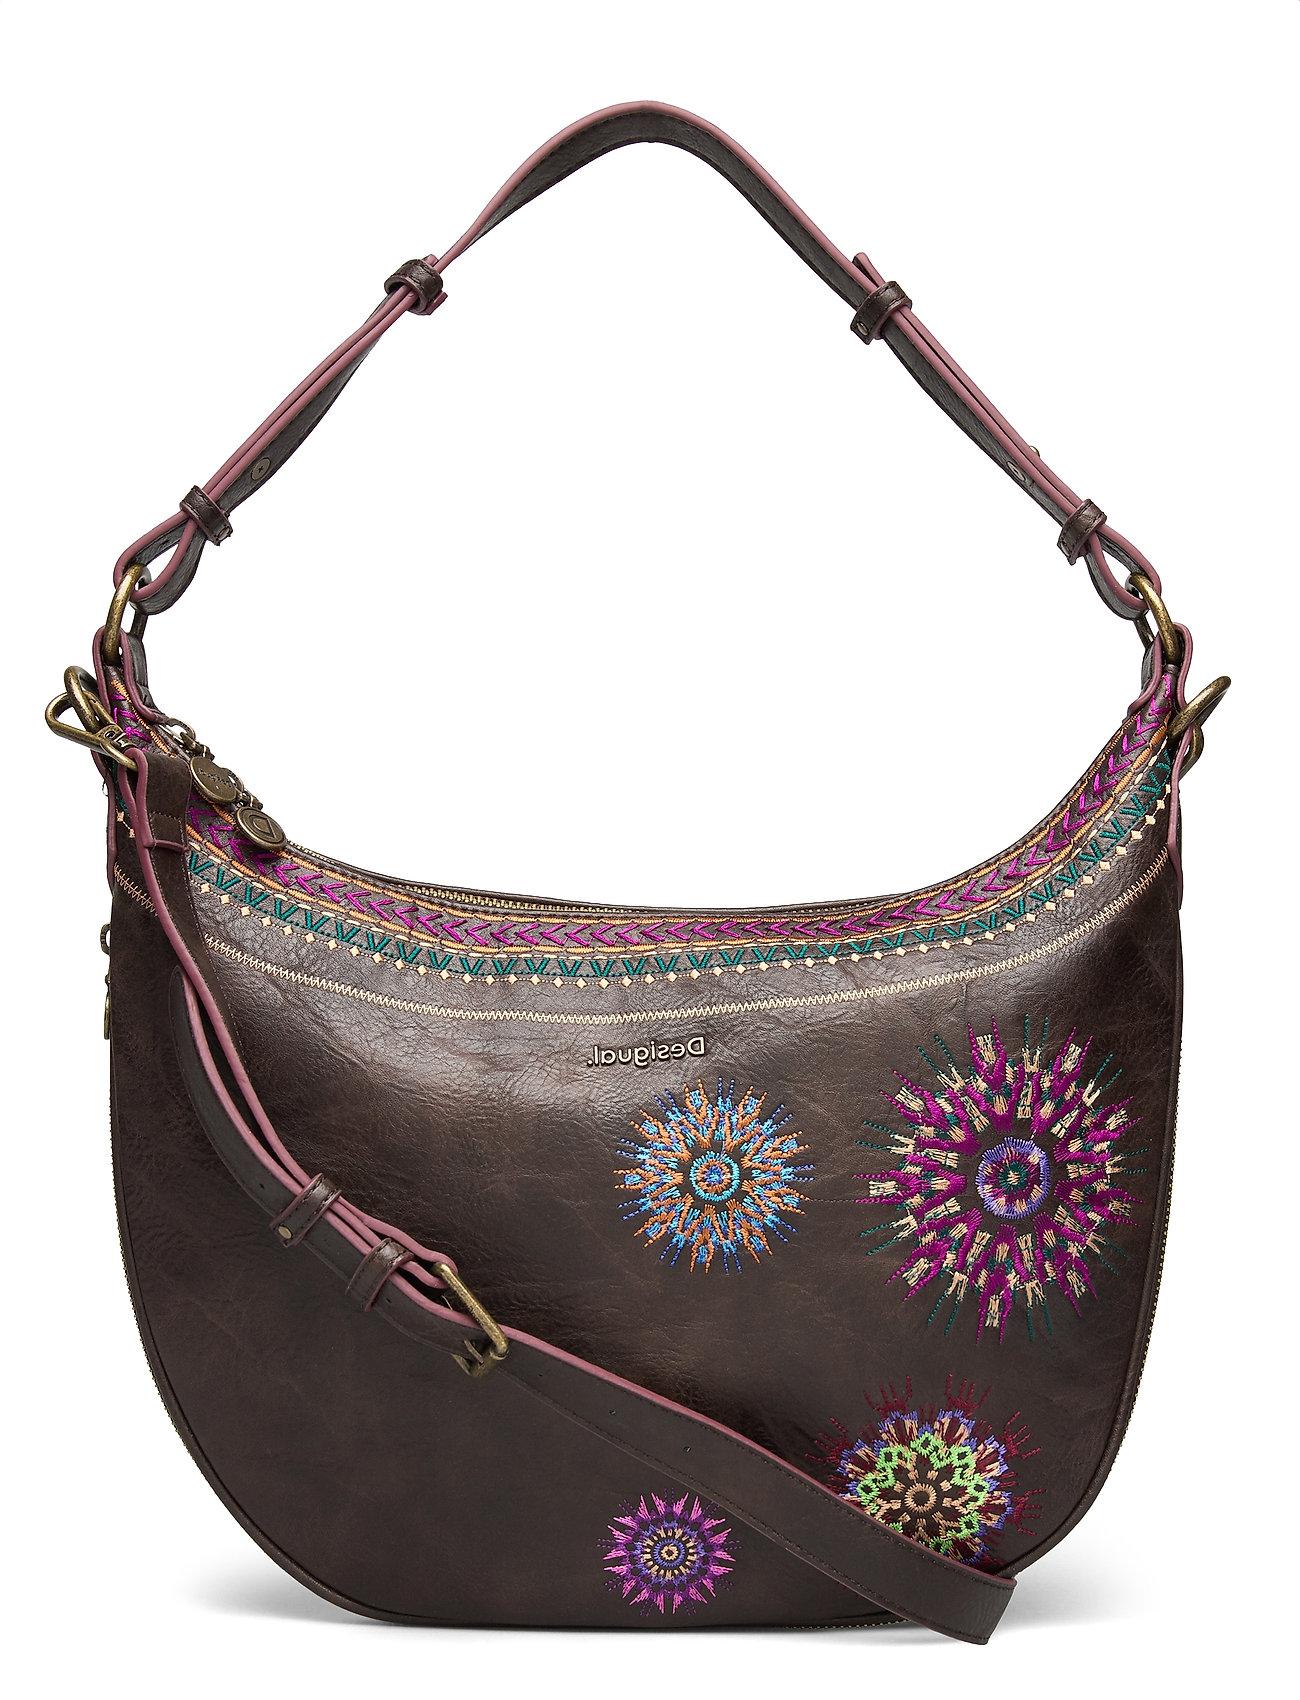 Image of Bols Astoria Sibe Bags Top Handle Bags Brun Desigual Accessories (3452230105)